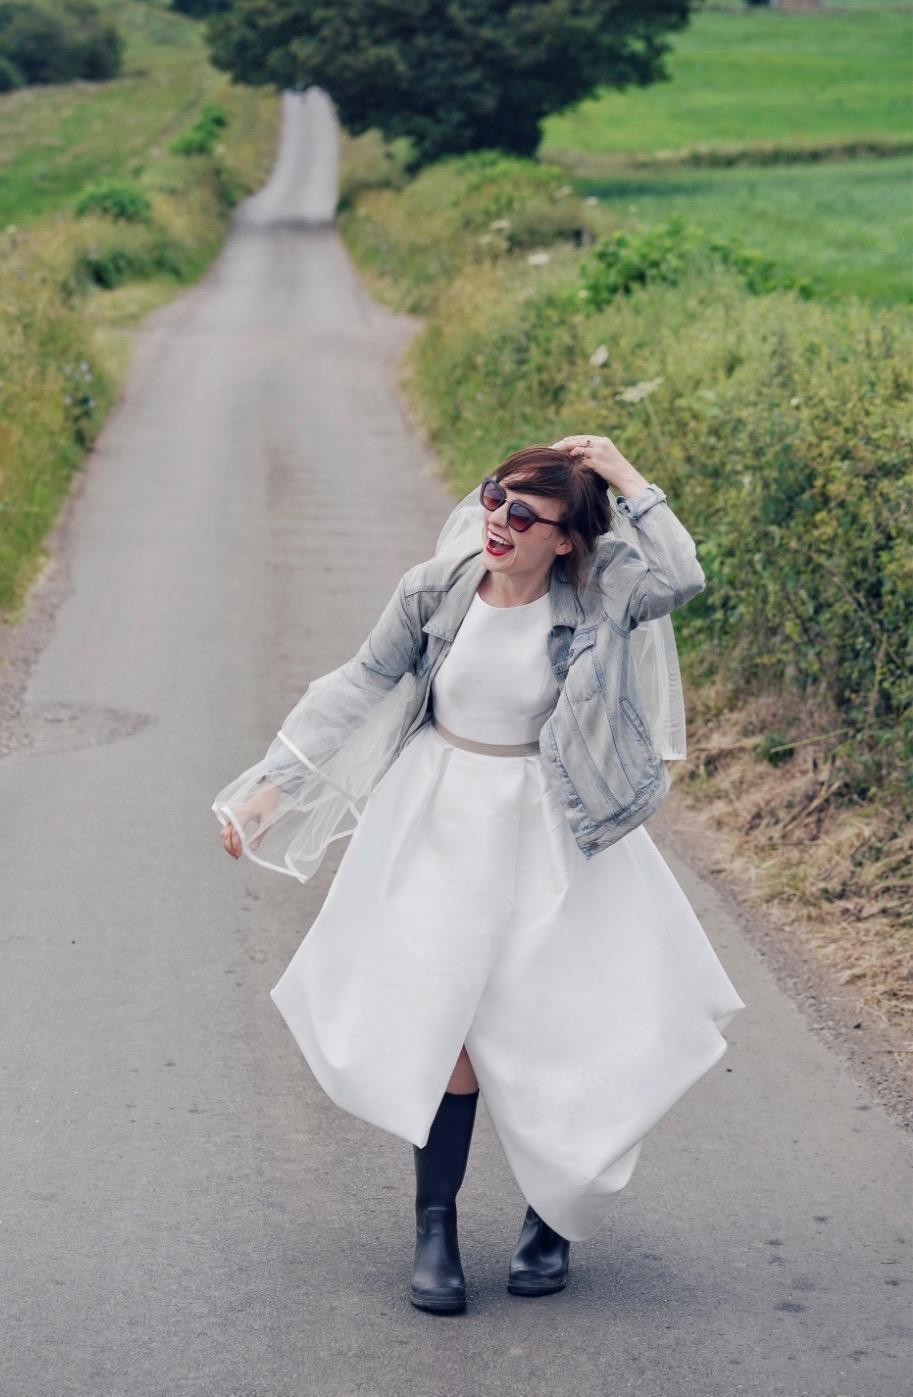 Bridal-Boutique-Bakewell-Derbyshire-19